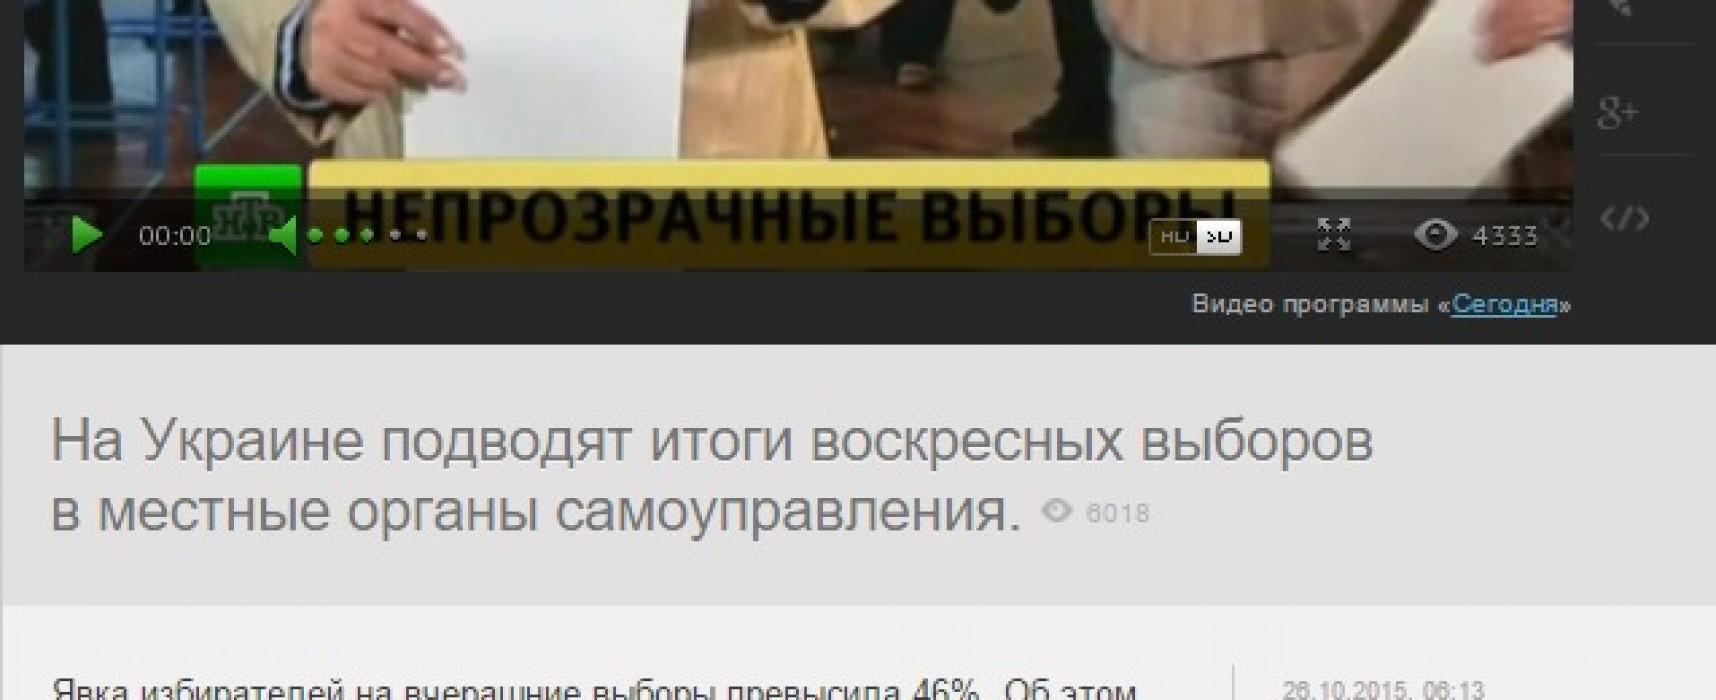 Russian Media Exaggerate Ukrainian Election Violations